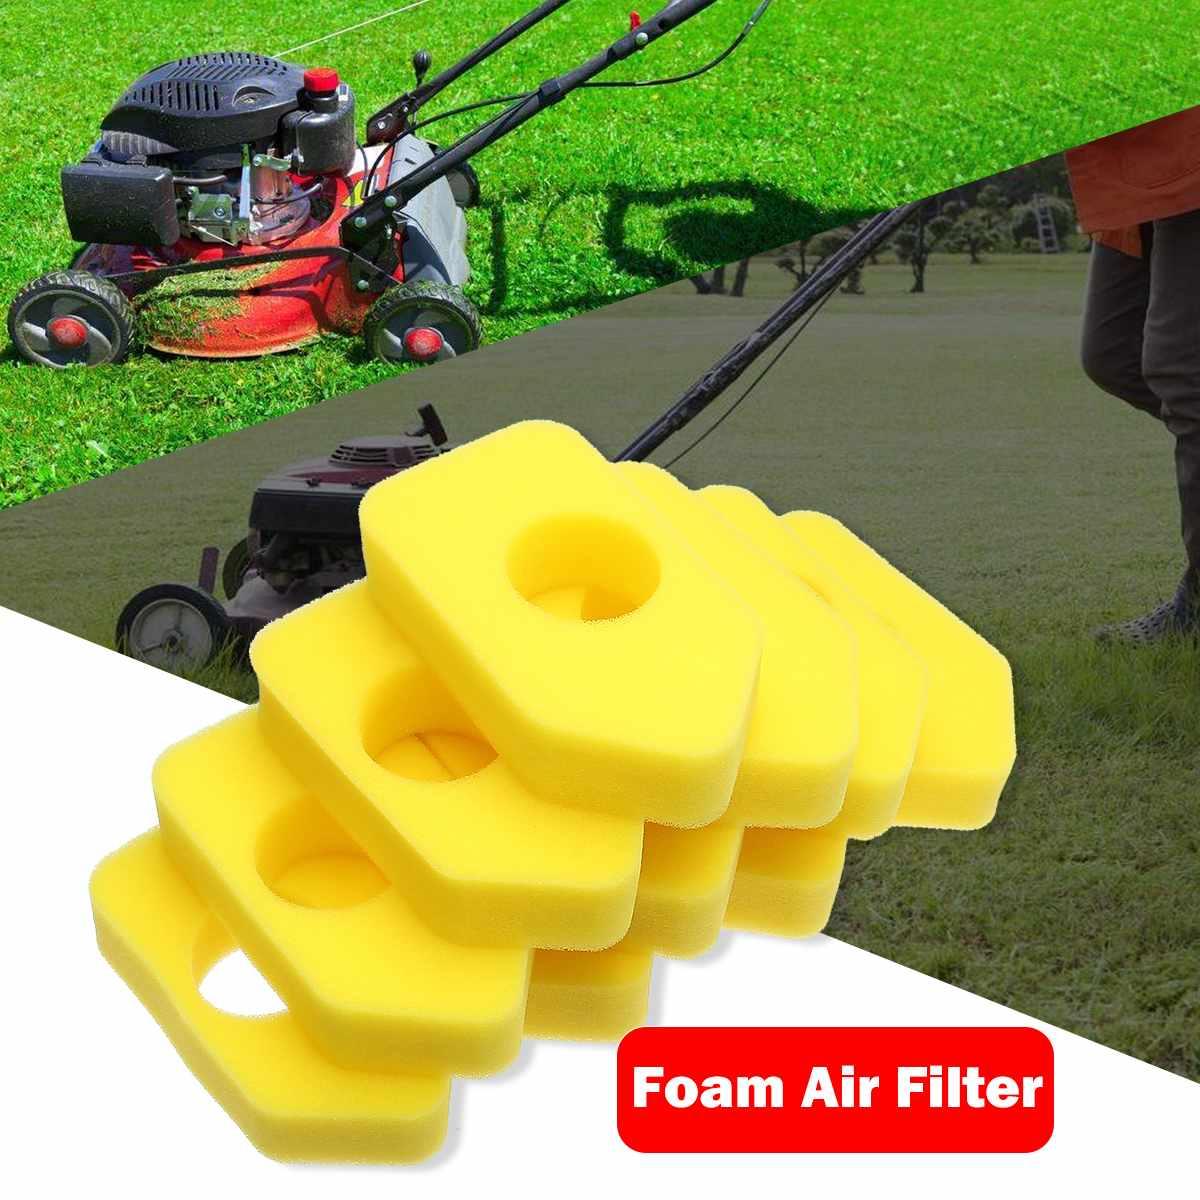 10x Yellow Foam Air Filter For Briggs & Stratton 698369 4216 5088 490-200-0011 Lawn Mower Air Filter Element